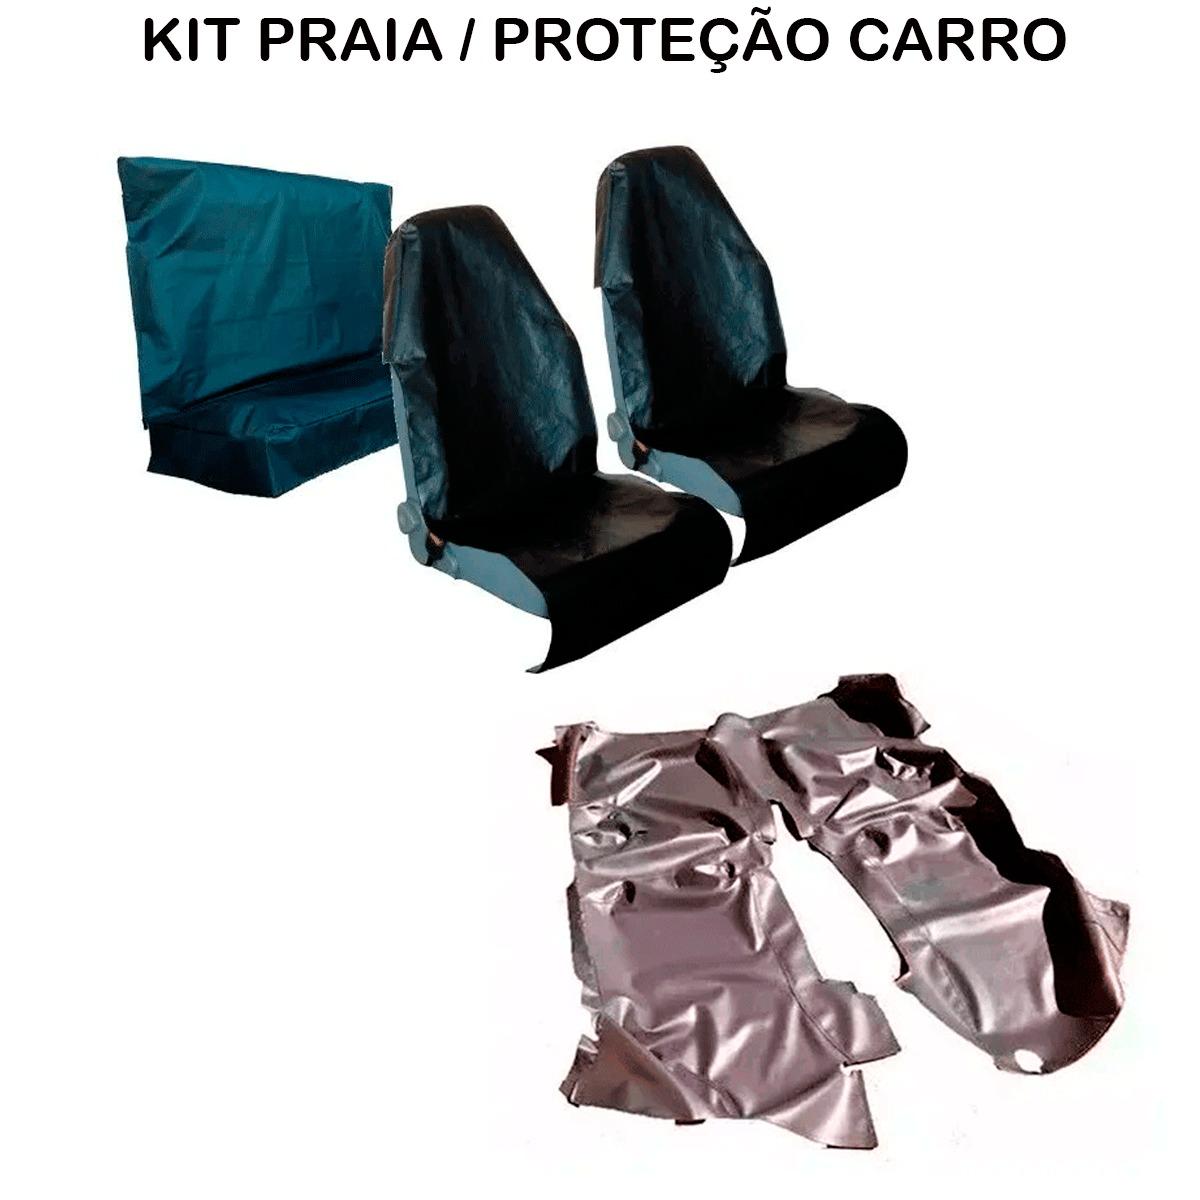 Tapete Em Vinil Volkswagen Parati G4 + Capa Banco Protecao Banco Areia Suor Academia